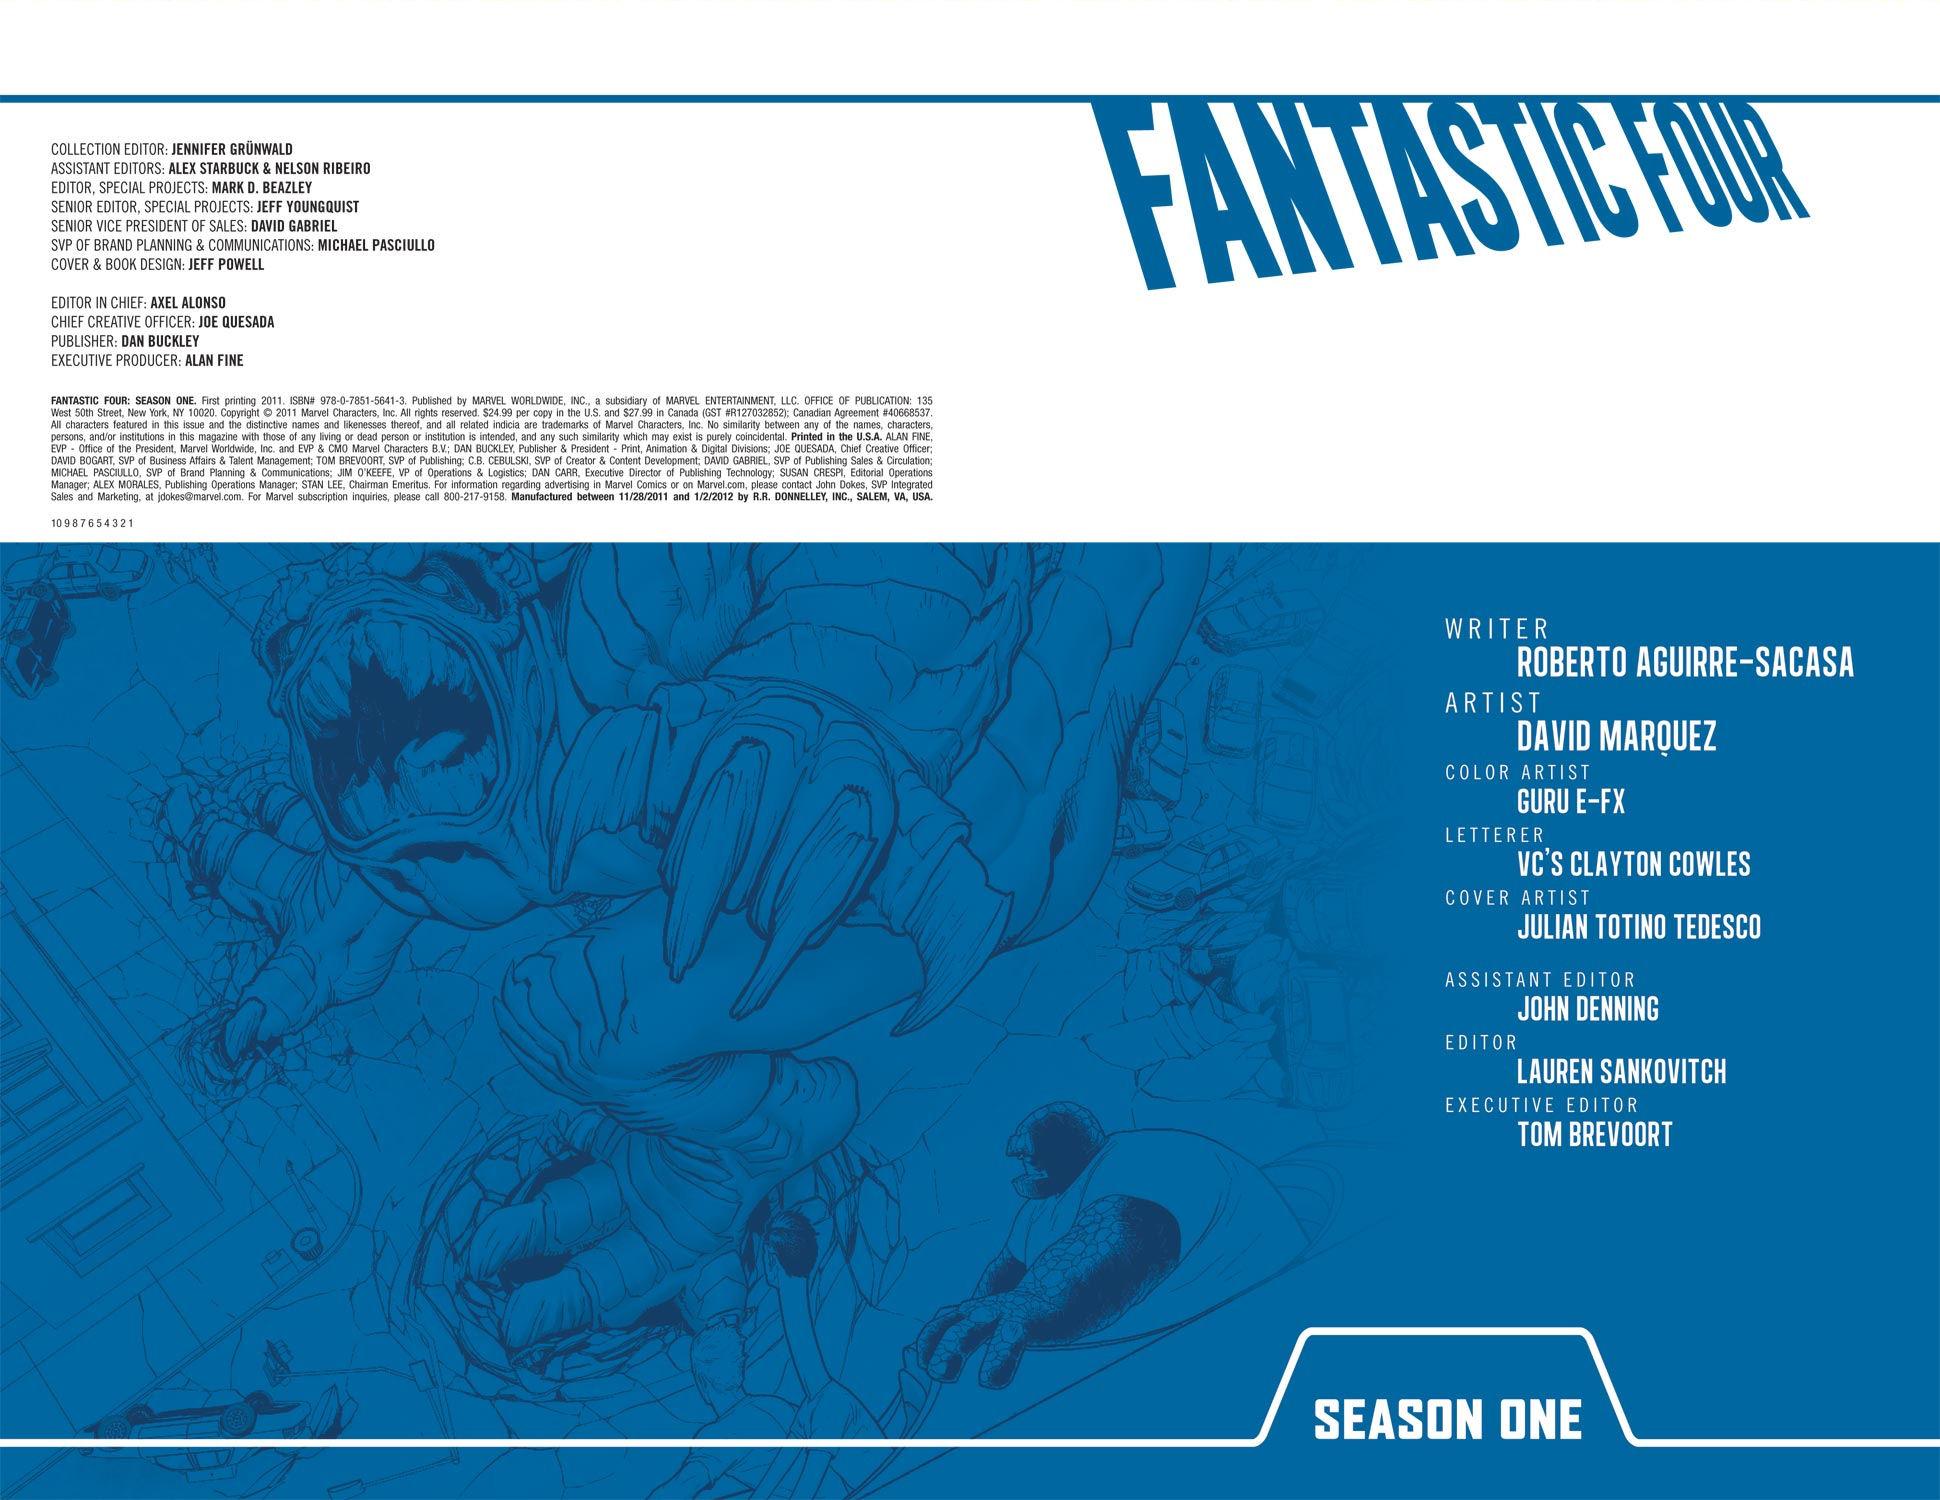 Read online Fantastic Four: Season One comic -  Issue # TPB - 3